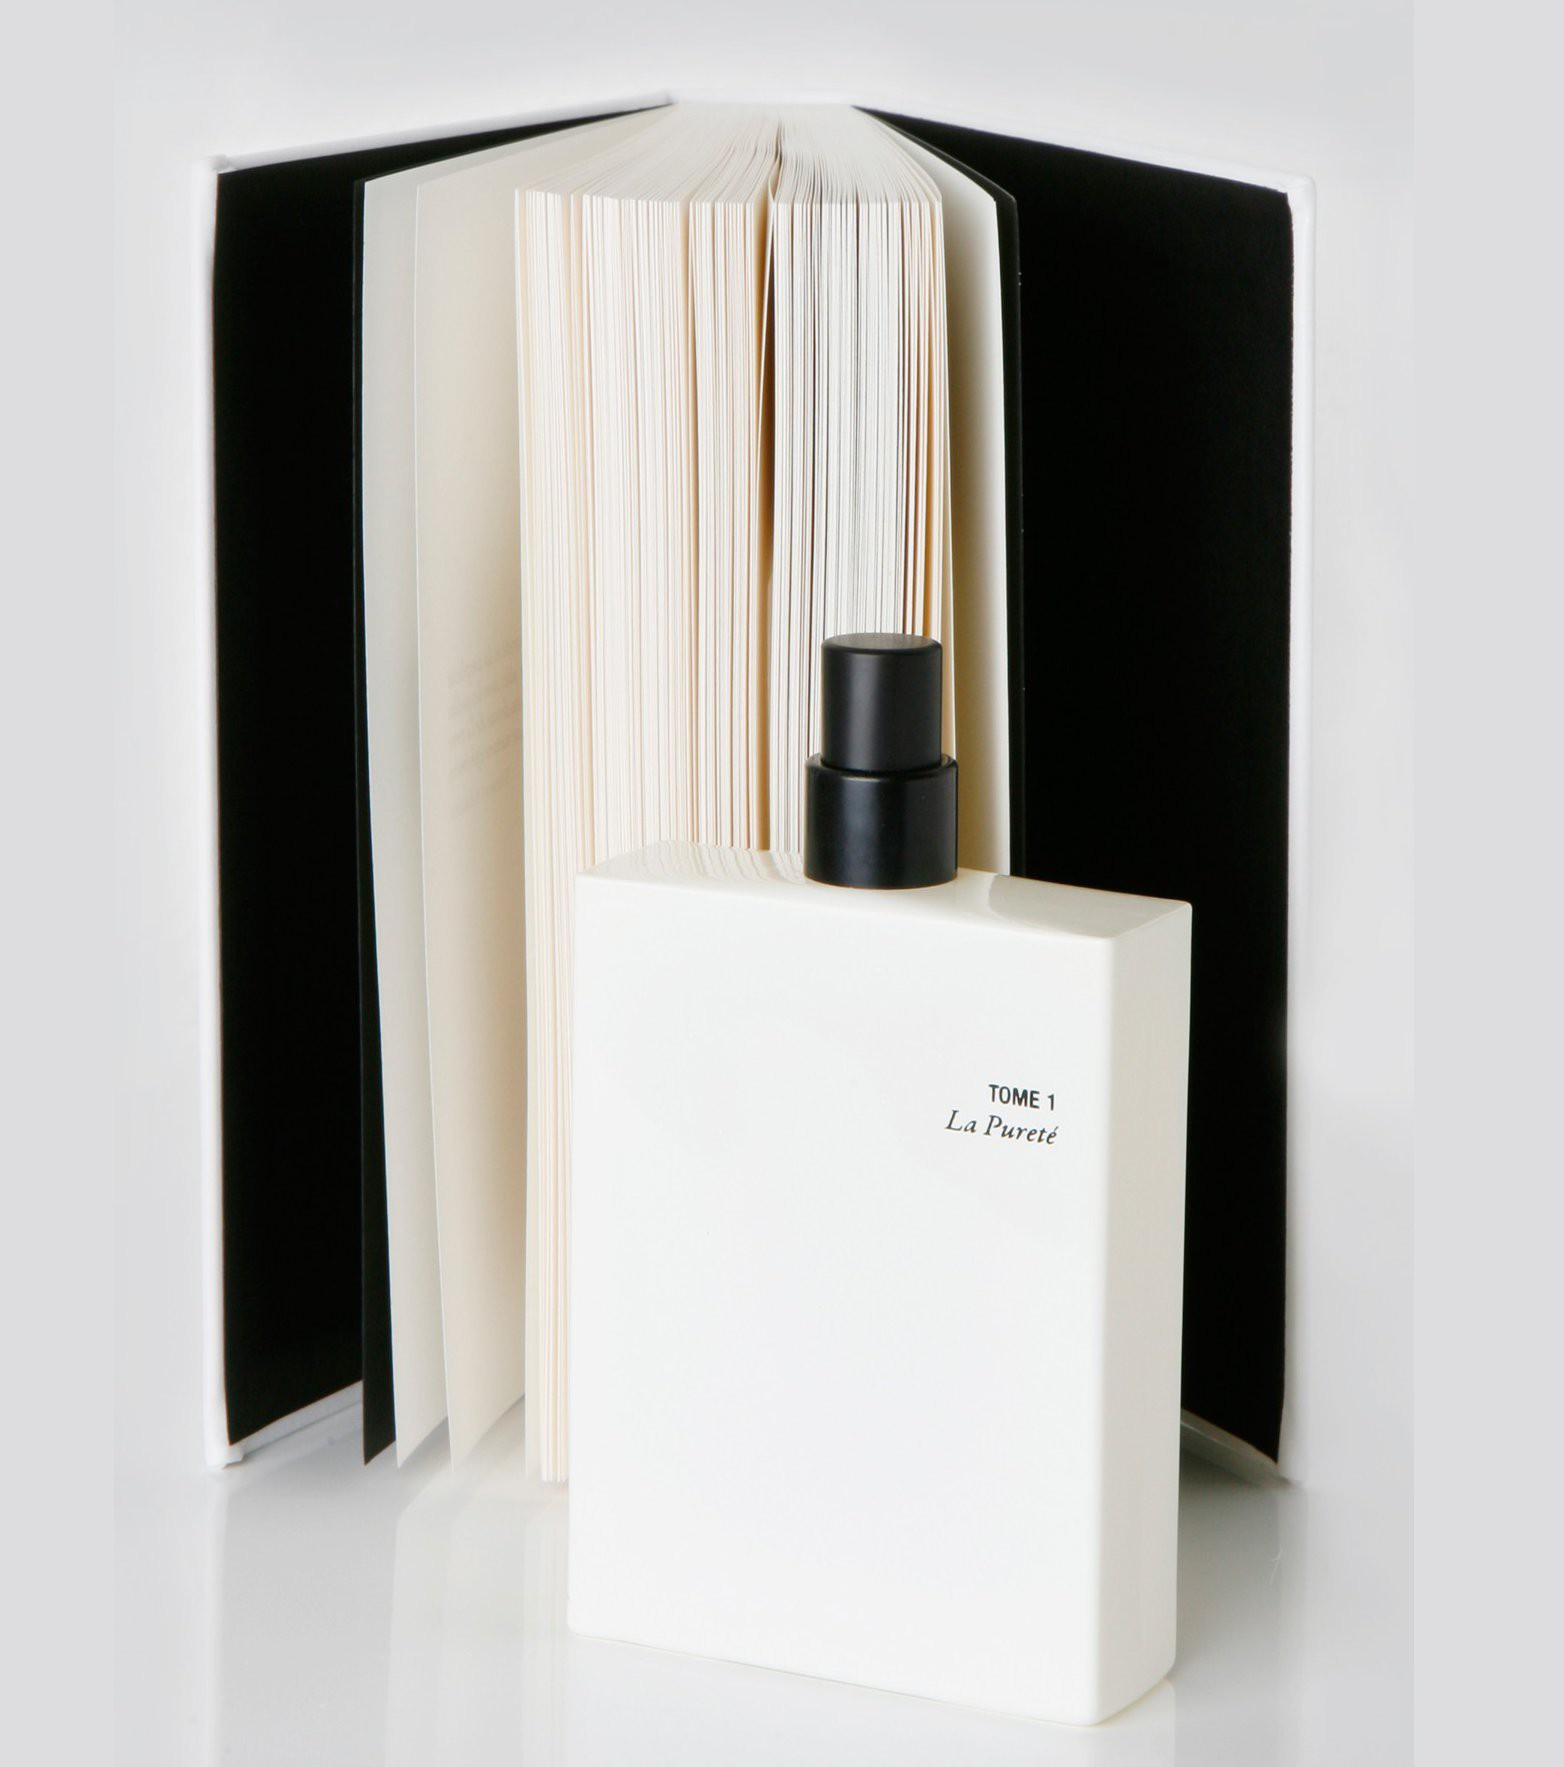 Zadig & Voltaire Tome 1 : La Pureté аромат для мужчин и женщин